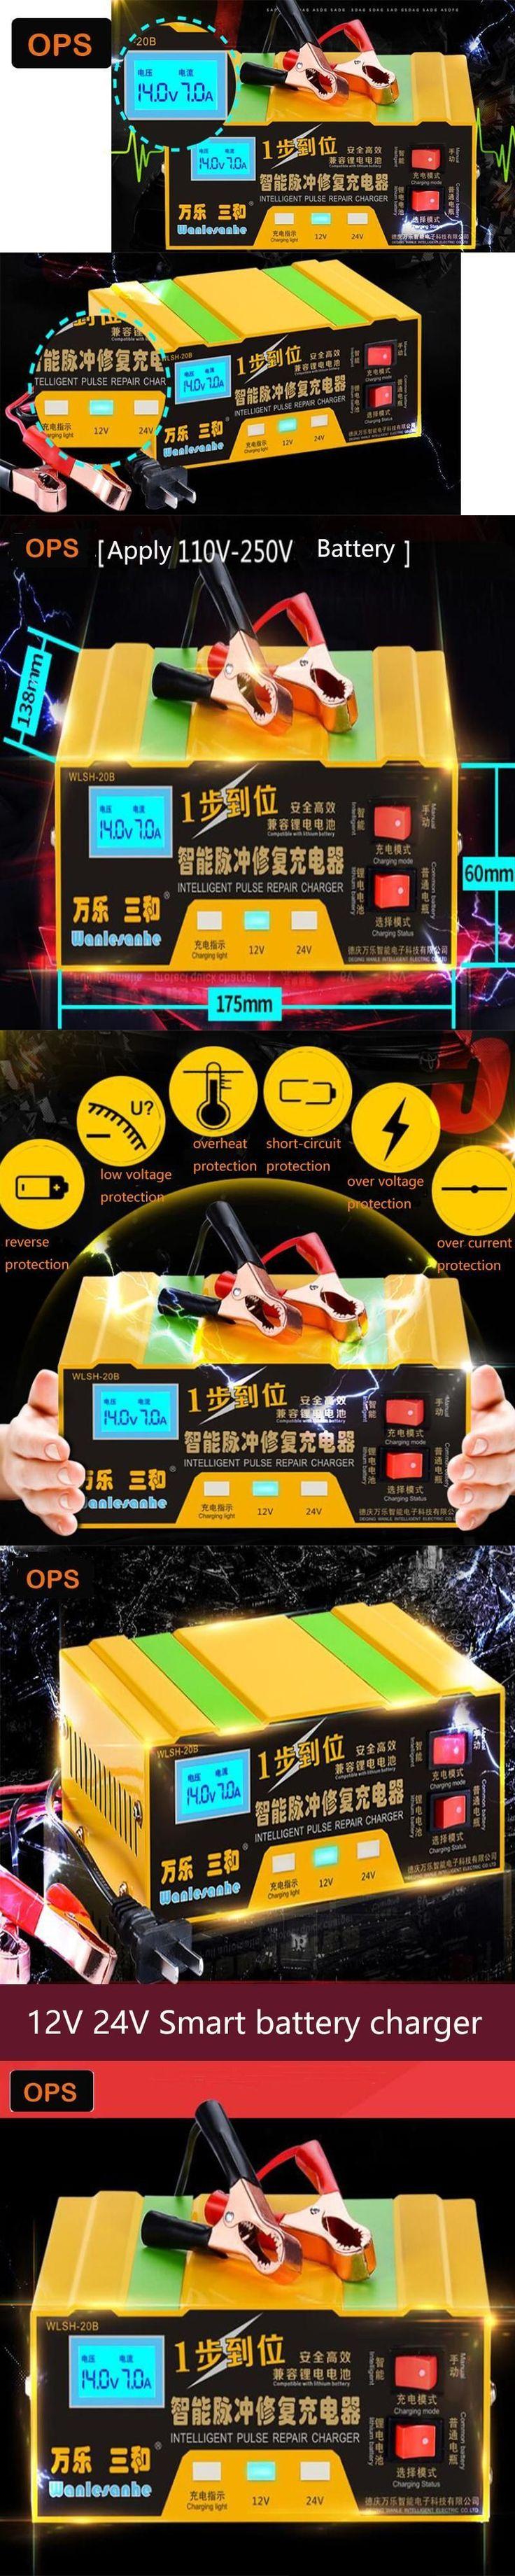 Motorcycle/Car 12V 24V Lead Acid &Lithium battery Smart Pulse Repair charger  Motorfiets Volt pure koper Slimme Acculader